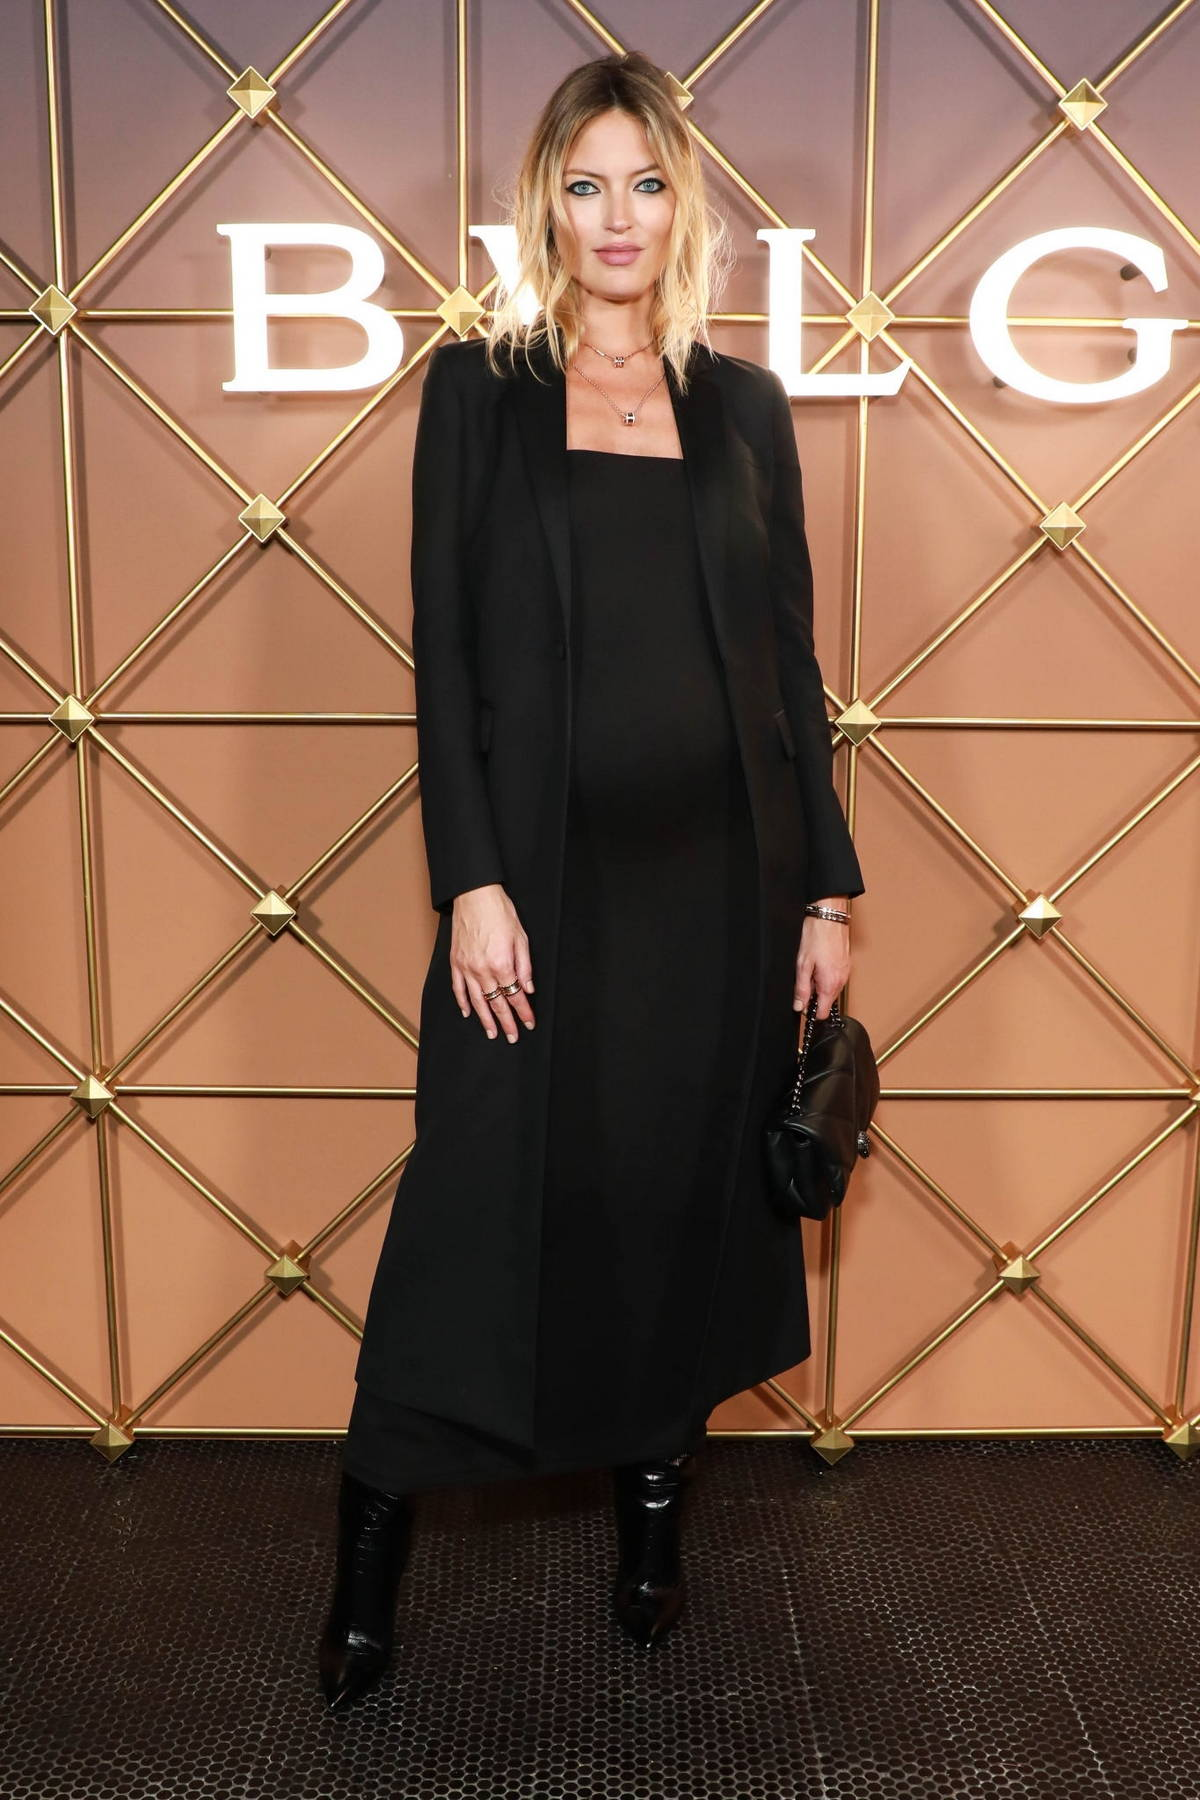 Martha Hunt attends the BVLGARI x B.zero1 Party in New York City